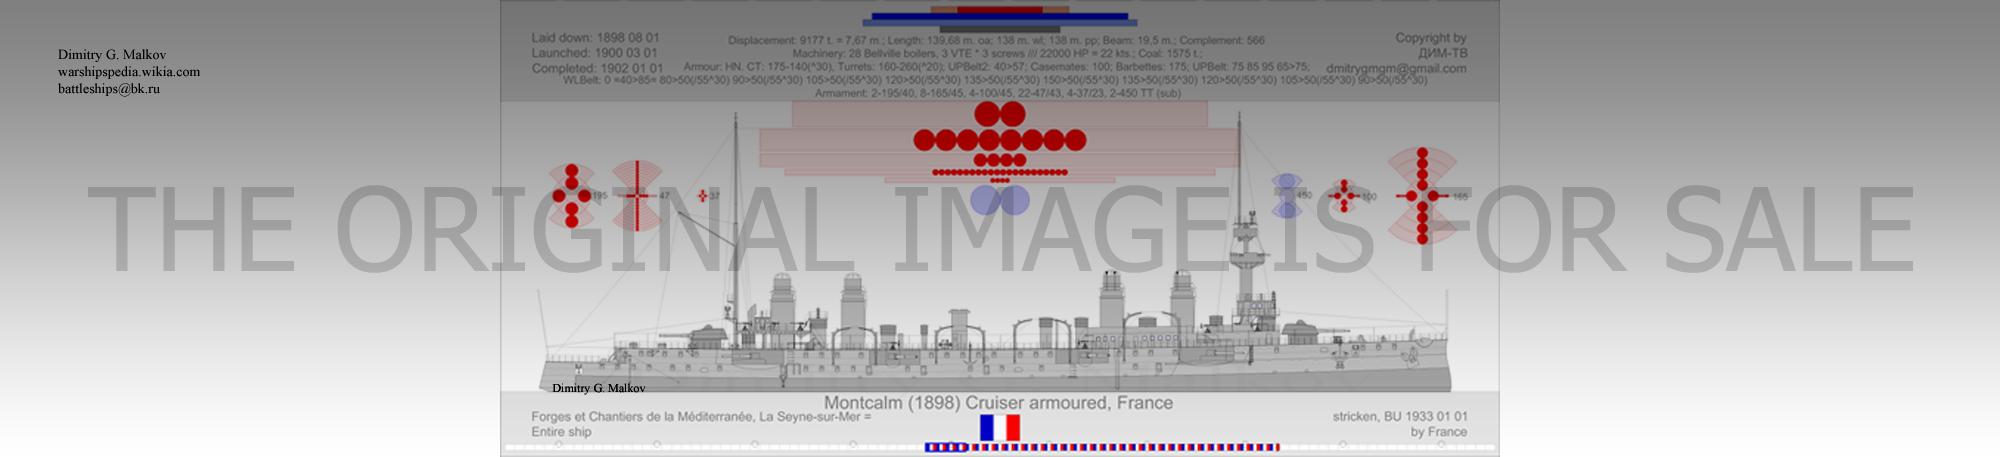 Mes dessins de navires français et de construction française - Page 14 Ca-18920